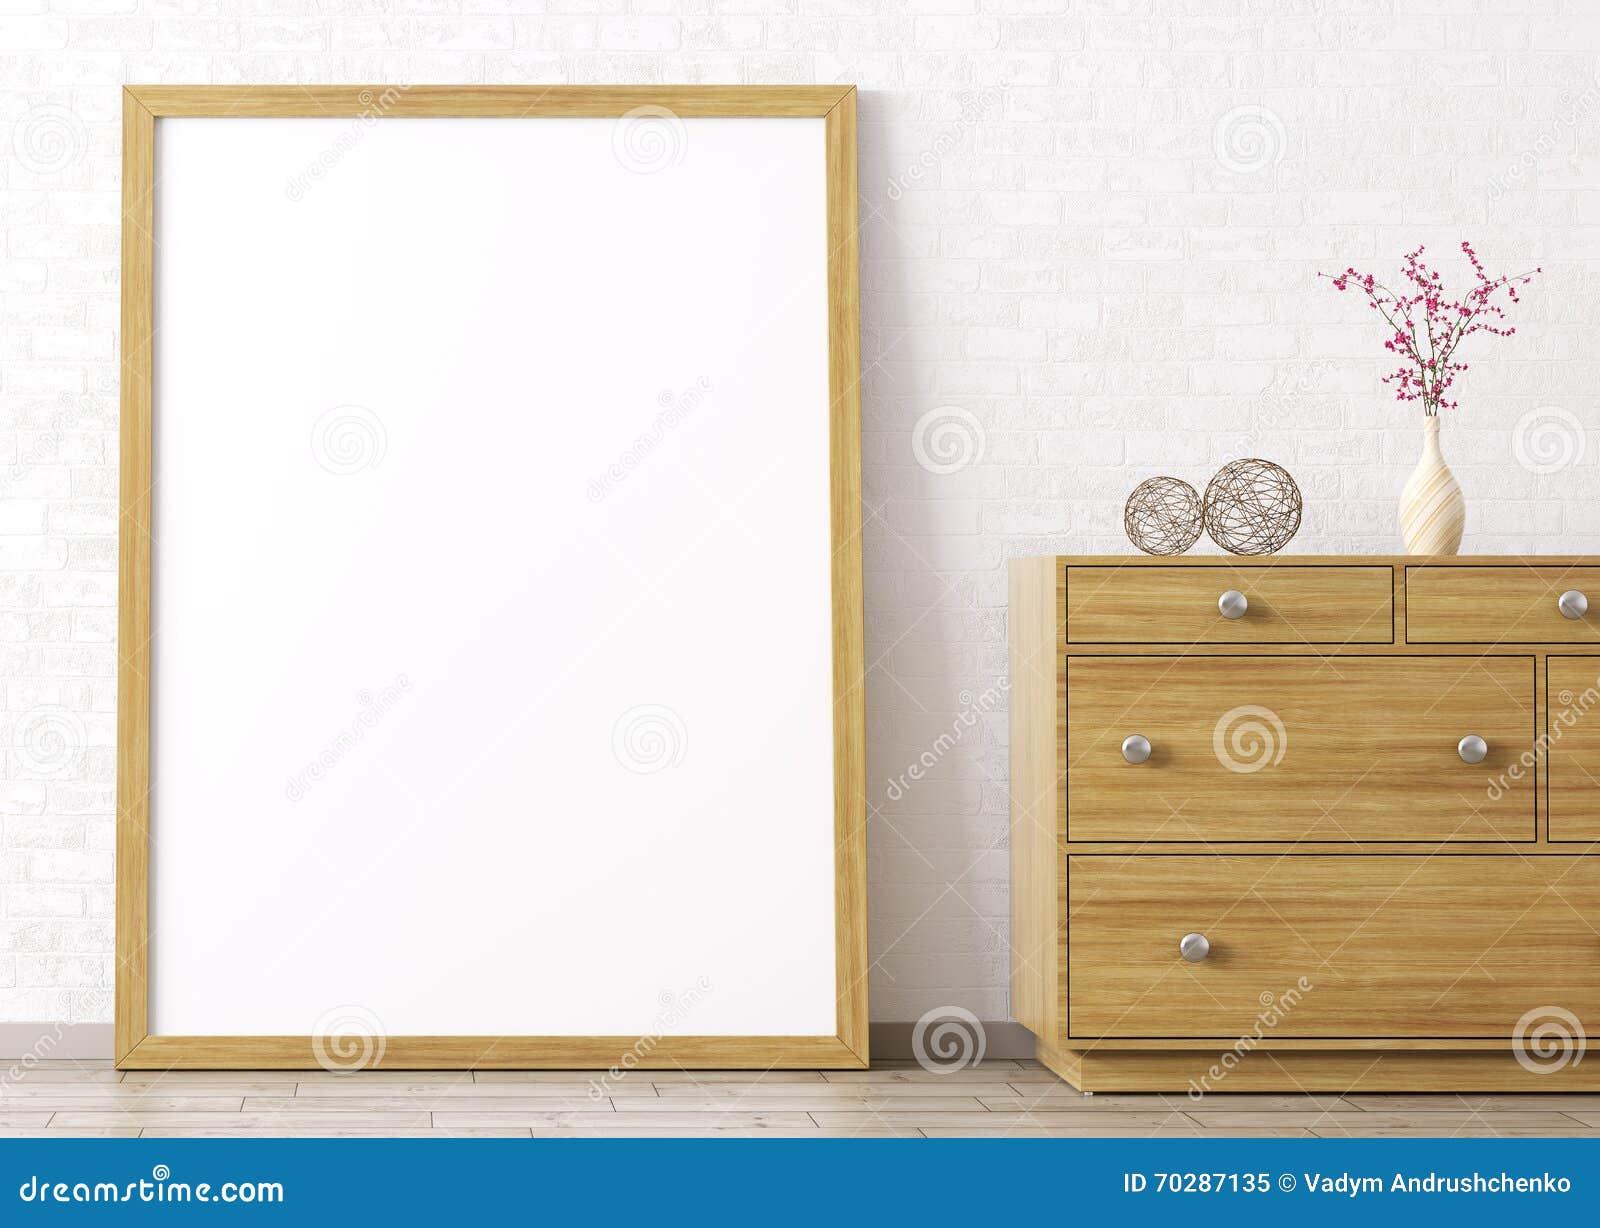 Wooden Frame And Dresser Interior Background 3d Rendering Stock ...